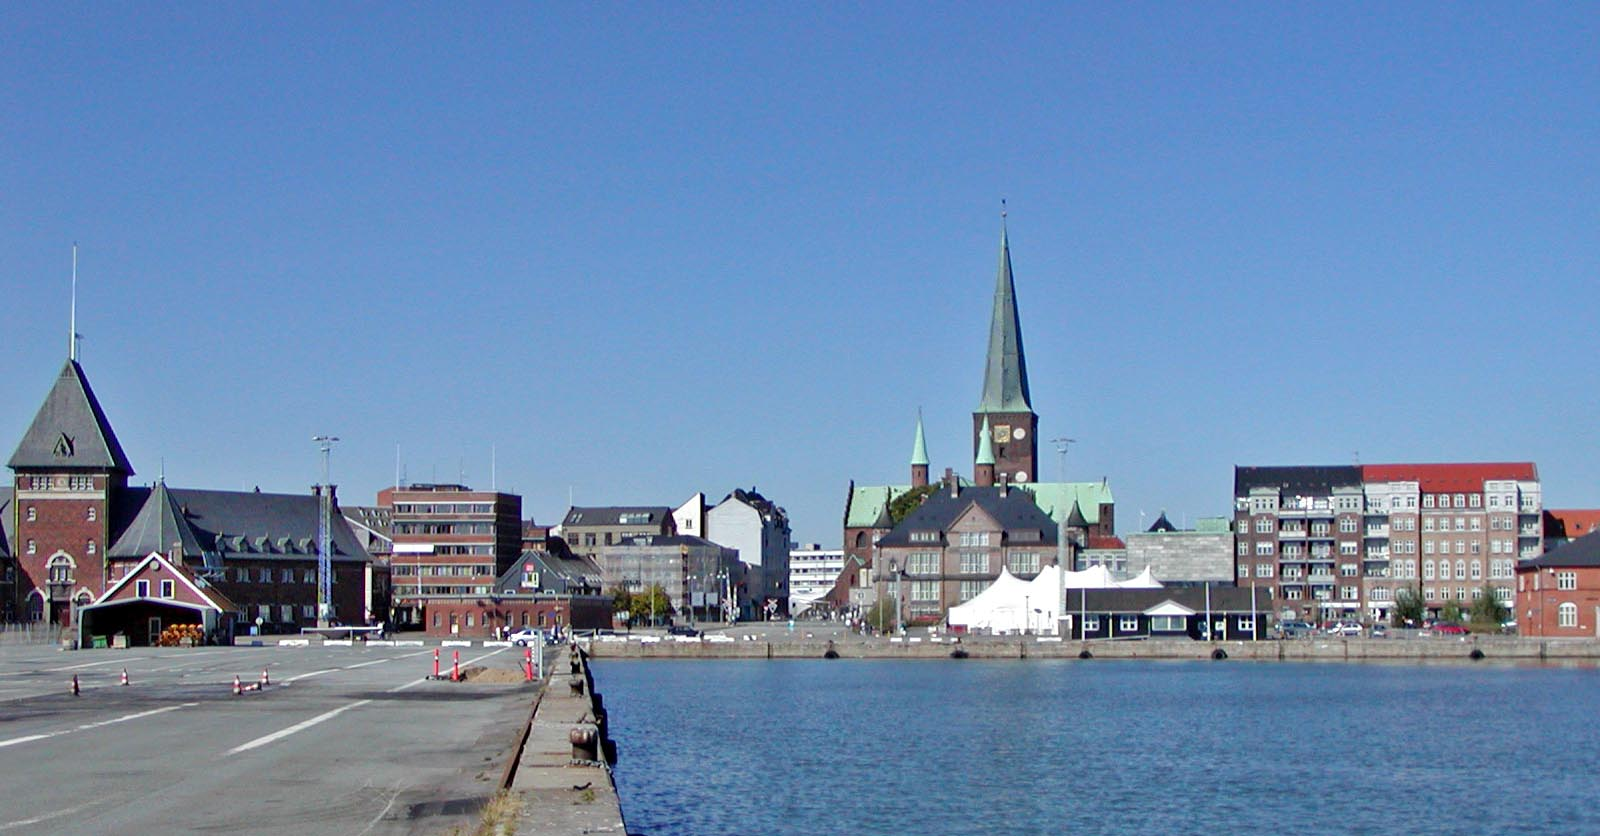 Aarhus Denmark  city photos gallery : Aarhus waterfront Wikimedia Commons